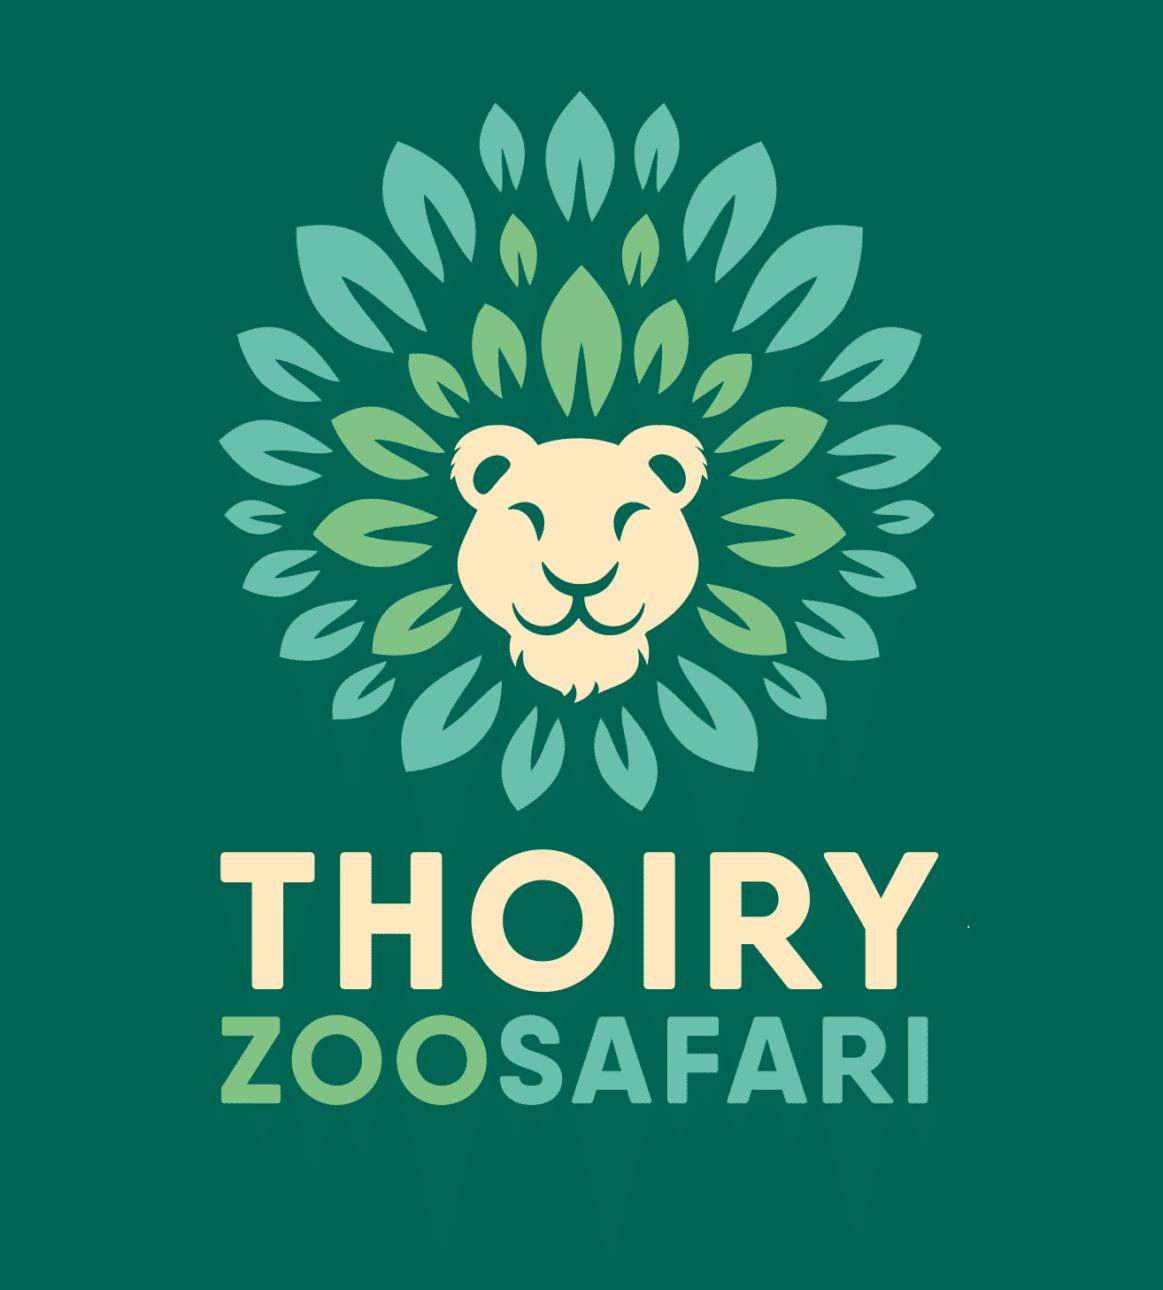 Les Zoos en France - Carte et infos saison 2020 28